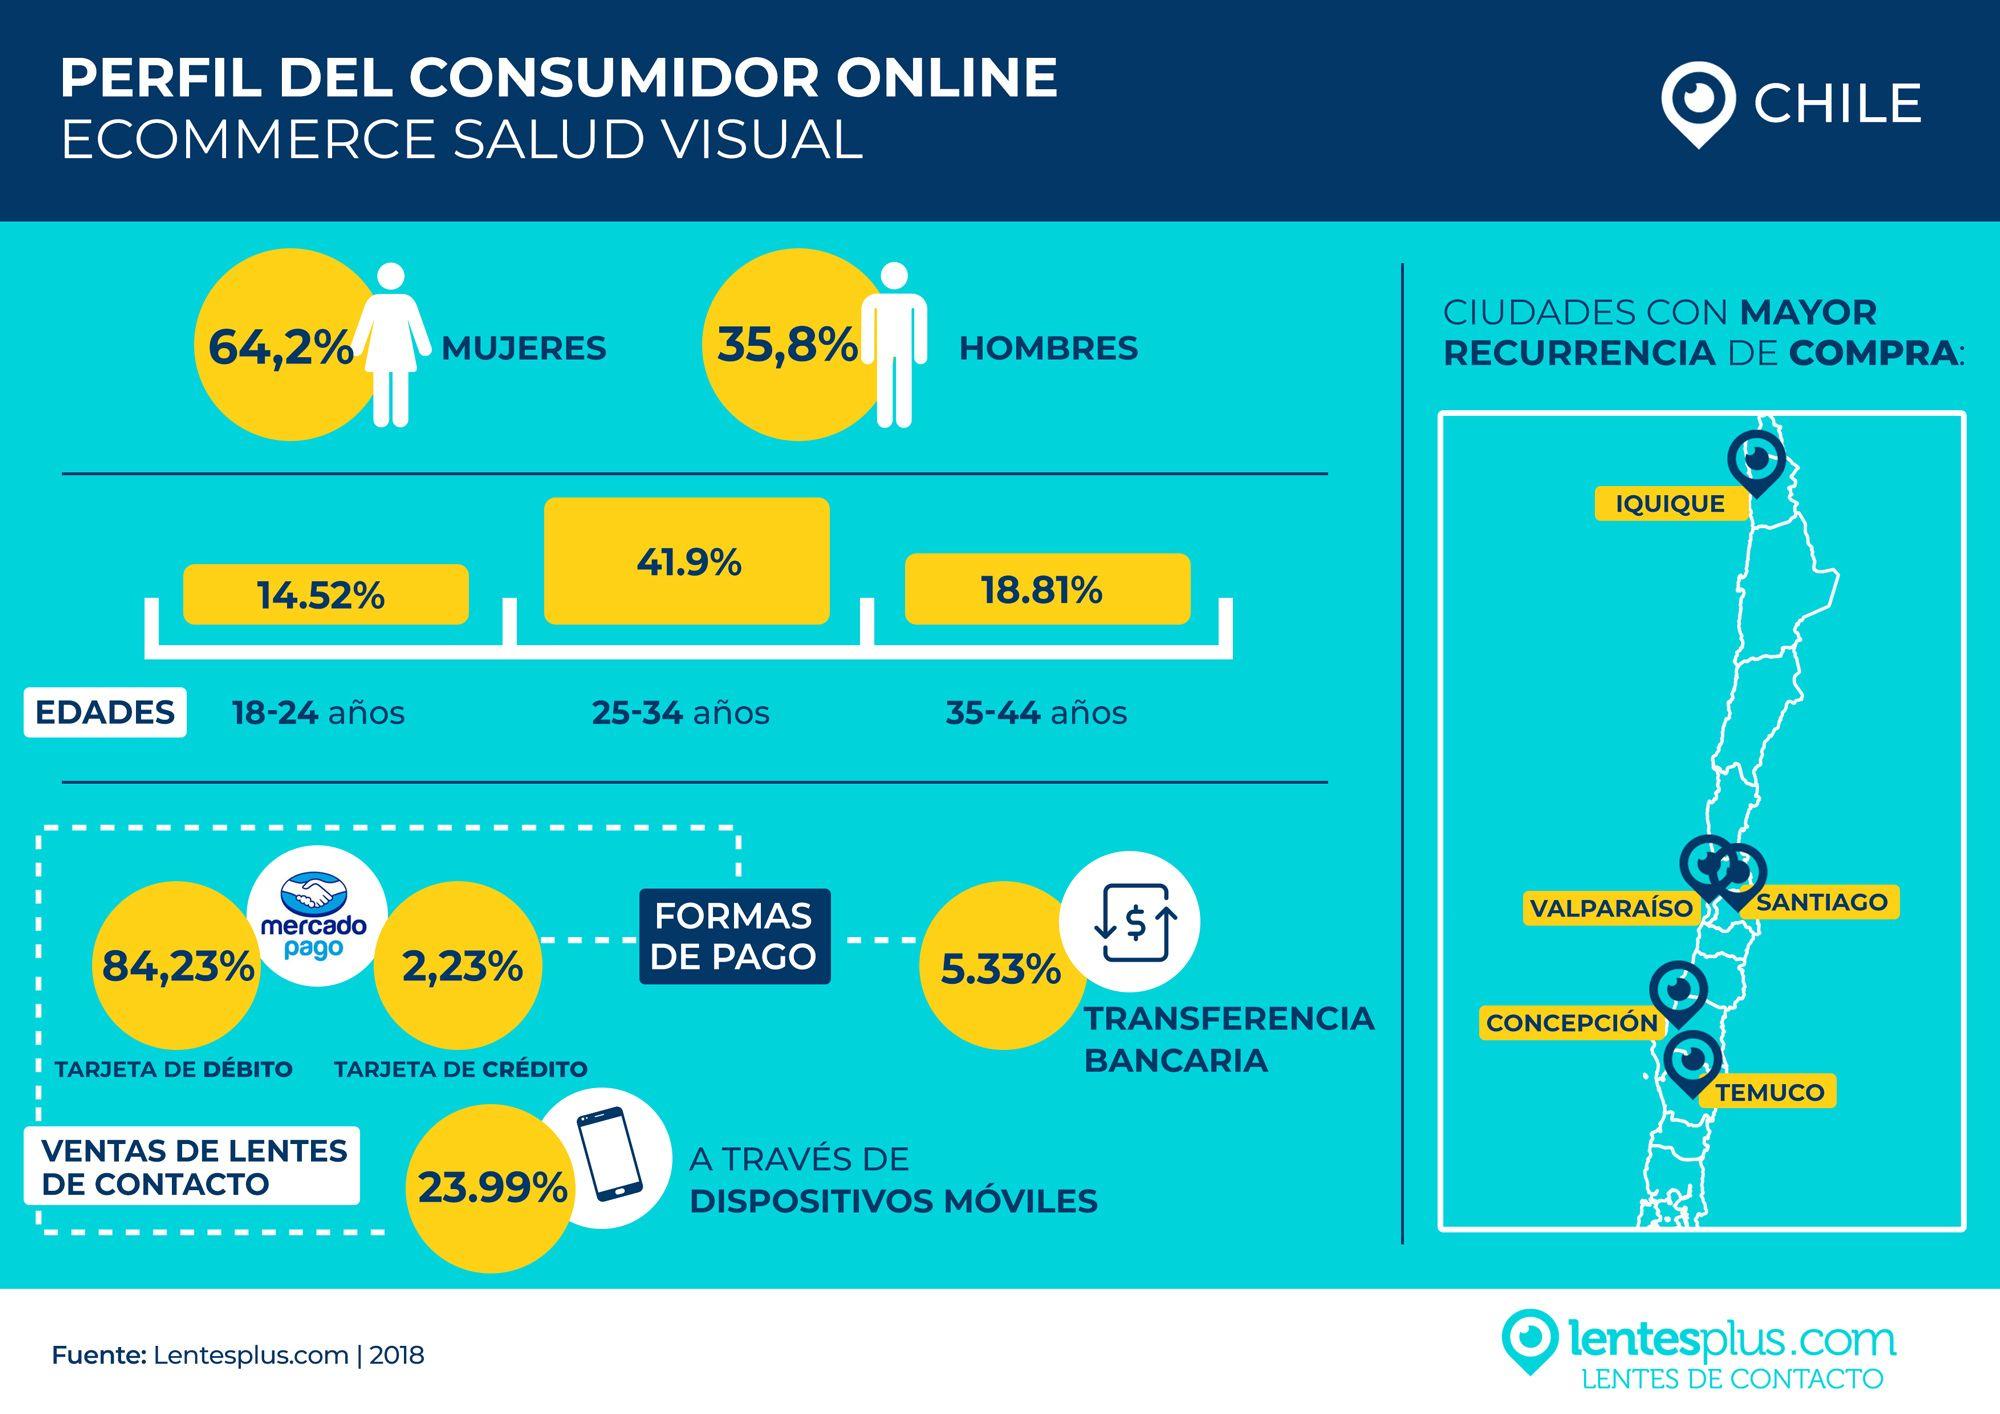 Foto de Perfil del Consumidor Online de Salud Visual chileno